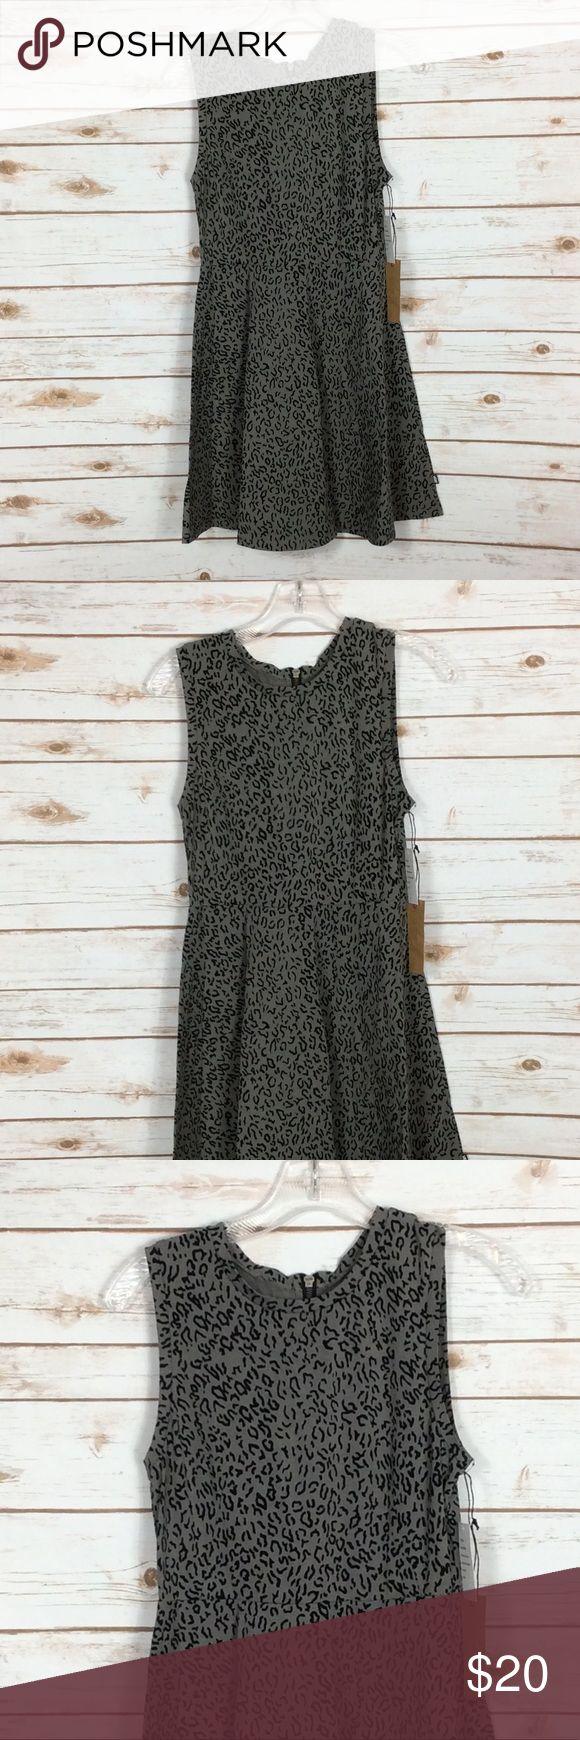 "Vans Dress Size medium. Cotton elastic blend. Skater fit. Has stretch. Black grey animal print. Zip back. Measurements approximately: Underarm to underarm 16"" Length 33"" Vans Dresses Mini"